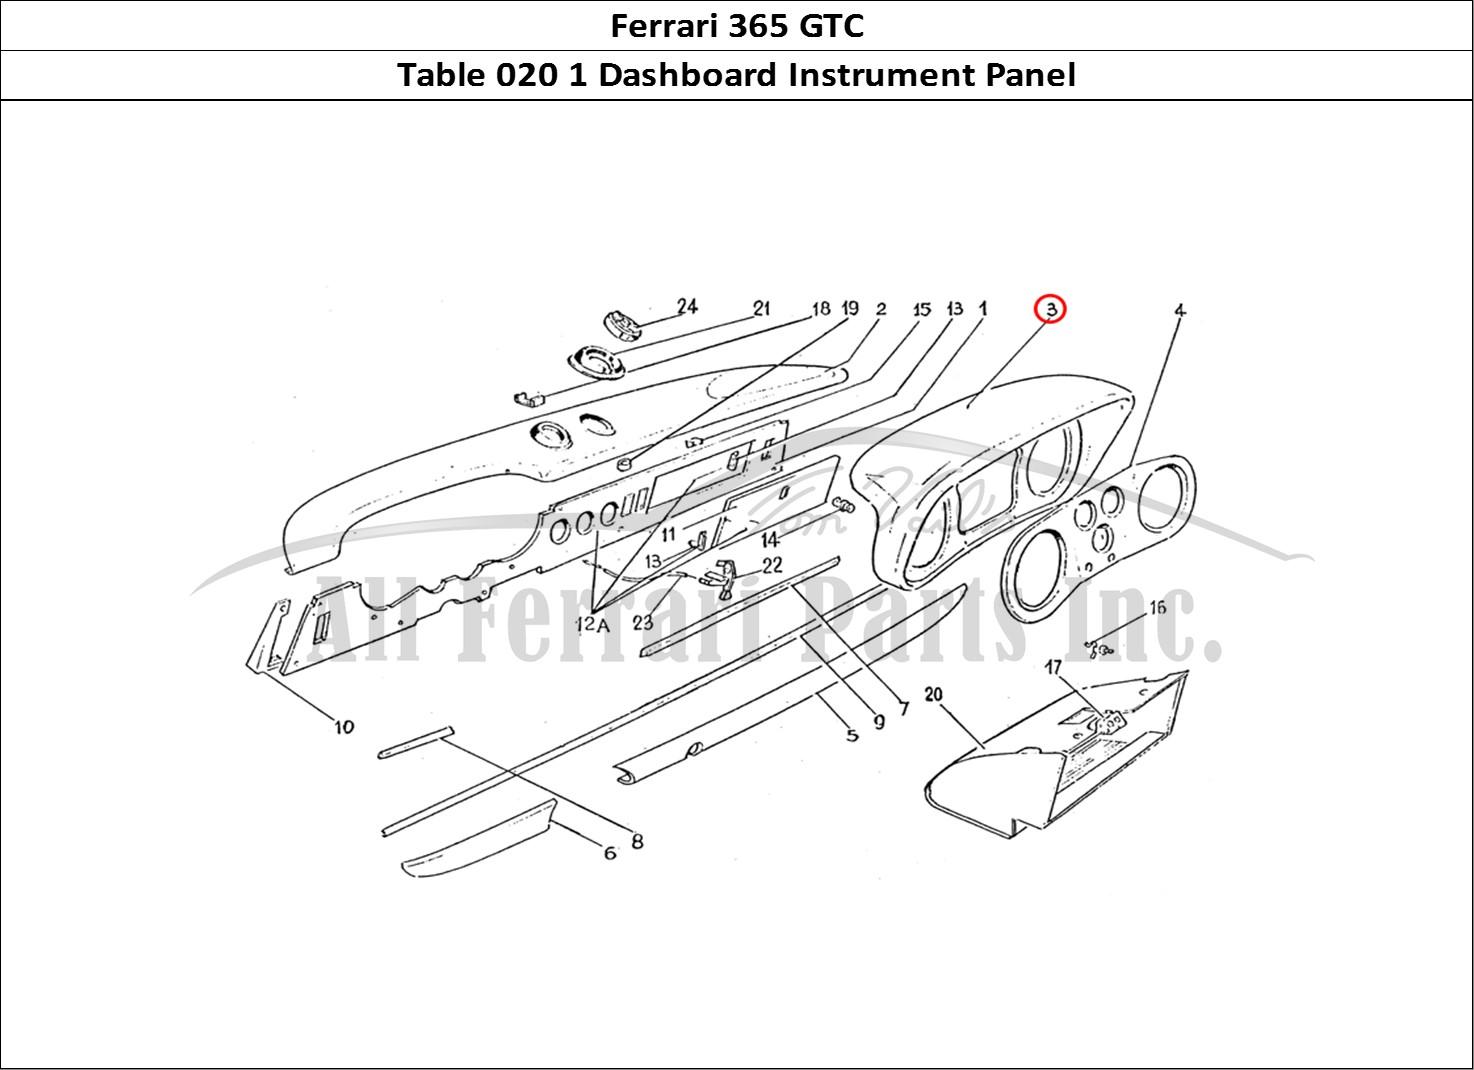 Buy Original Ferrari 365 Gtc 020 1 Dashboard Instrument